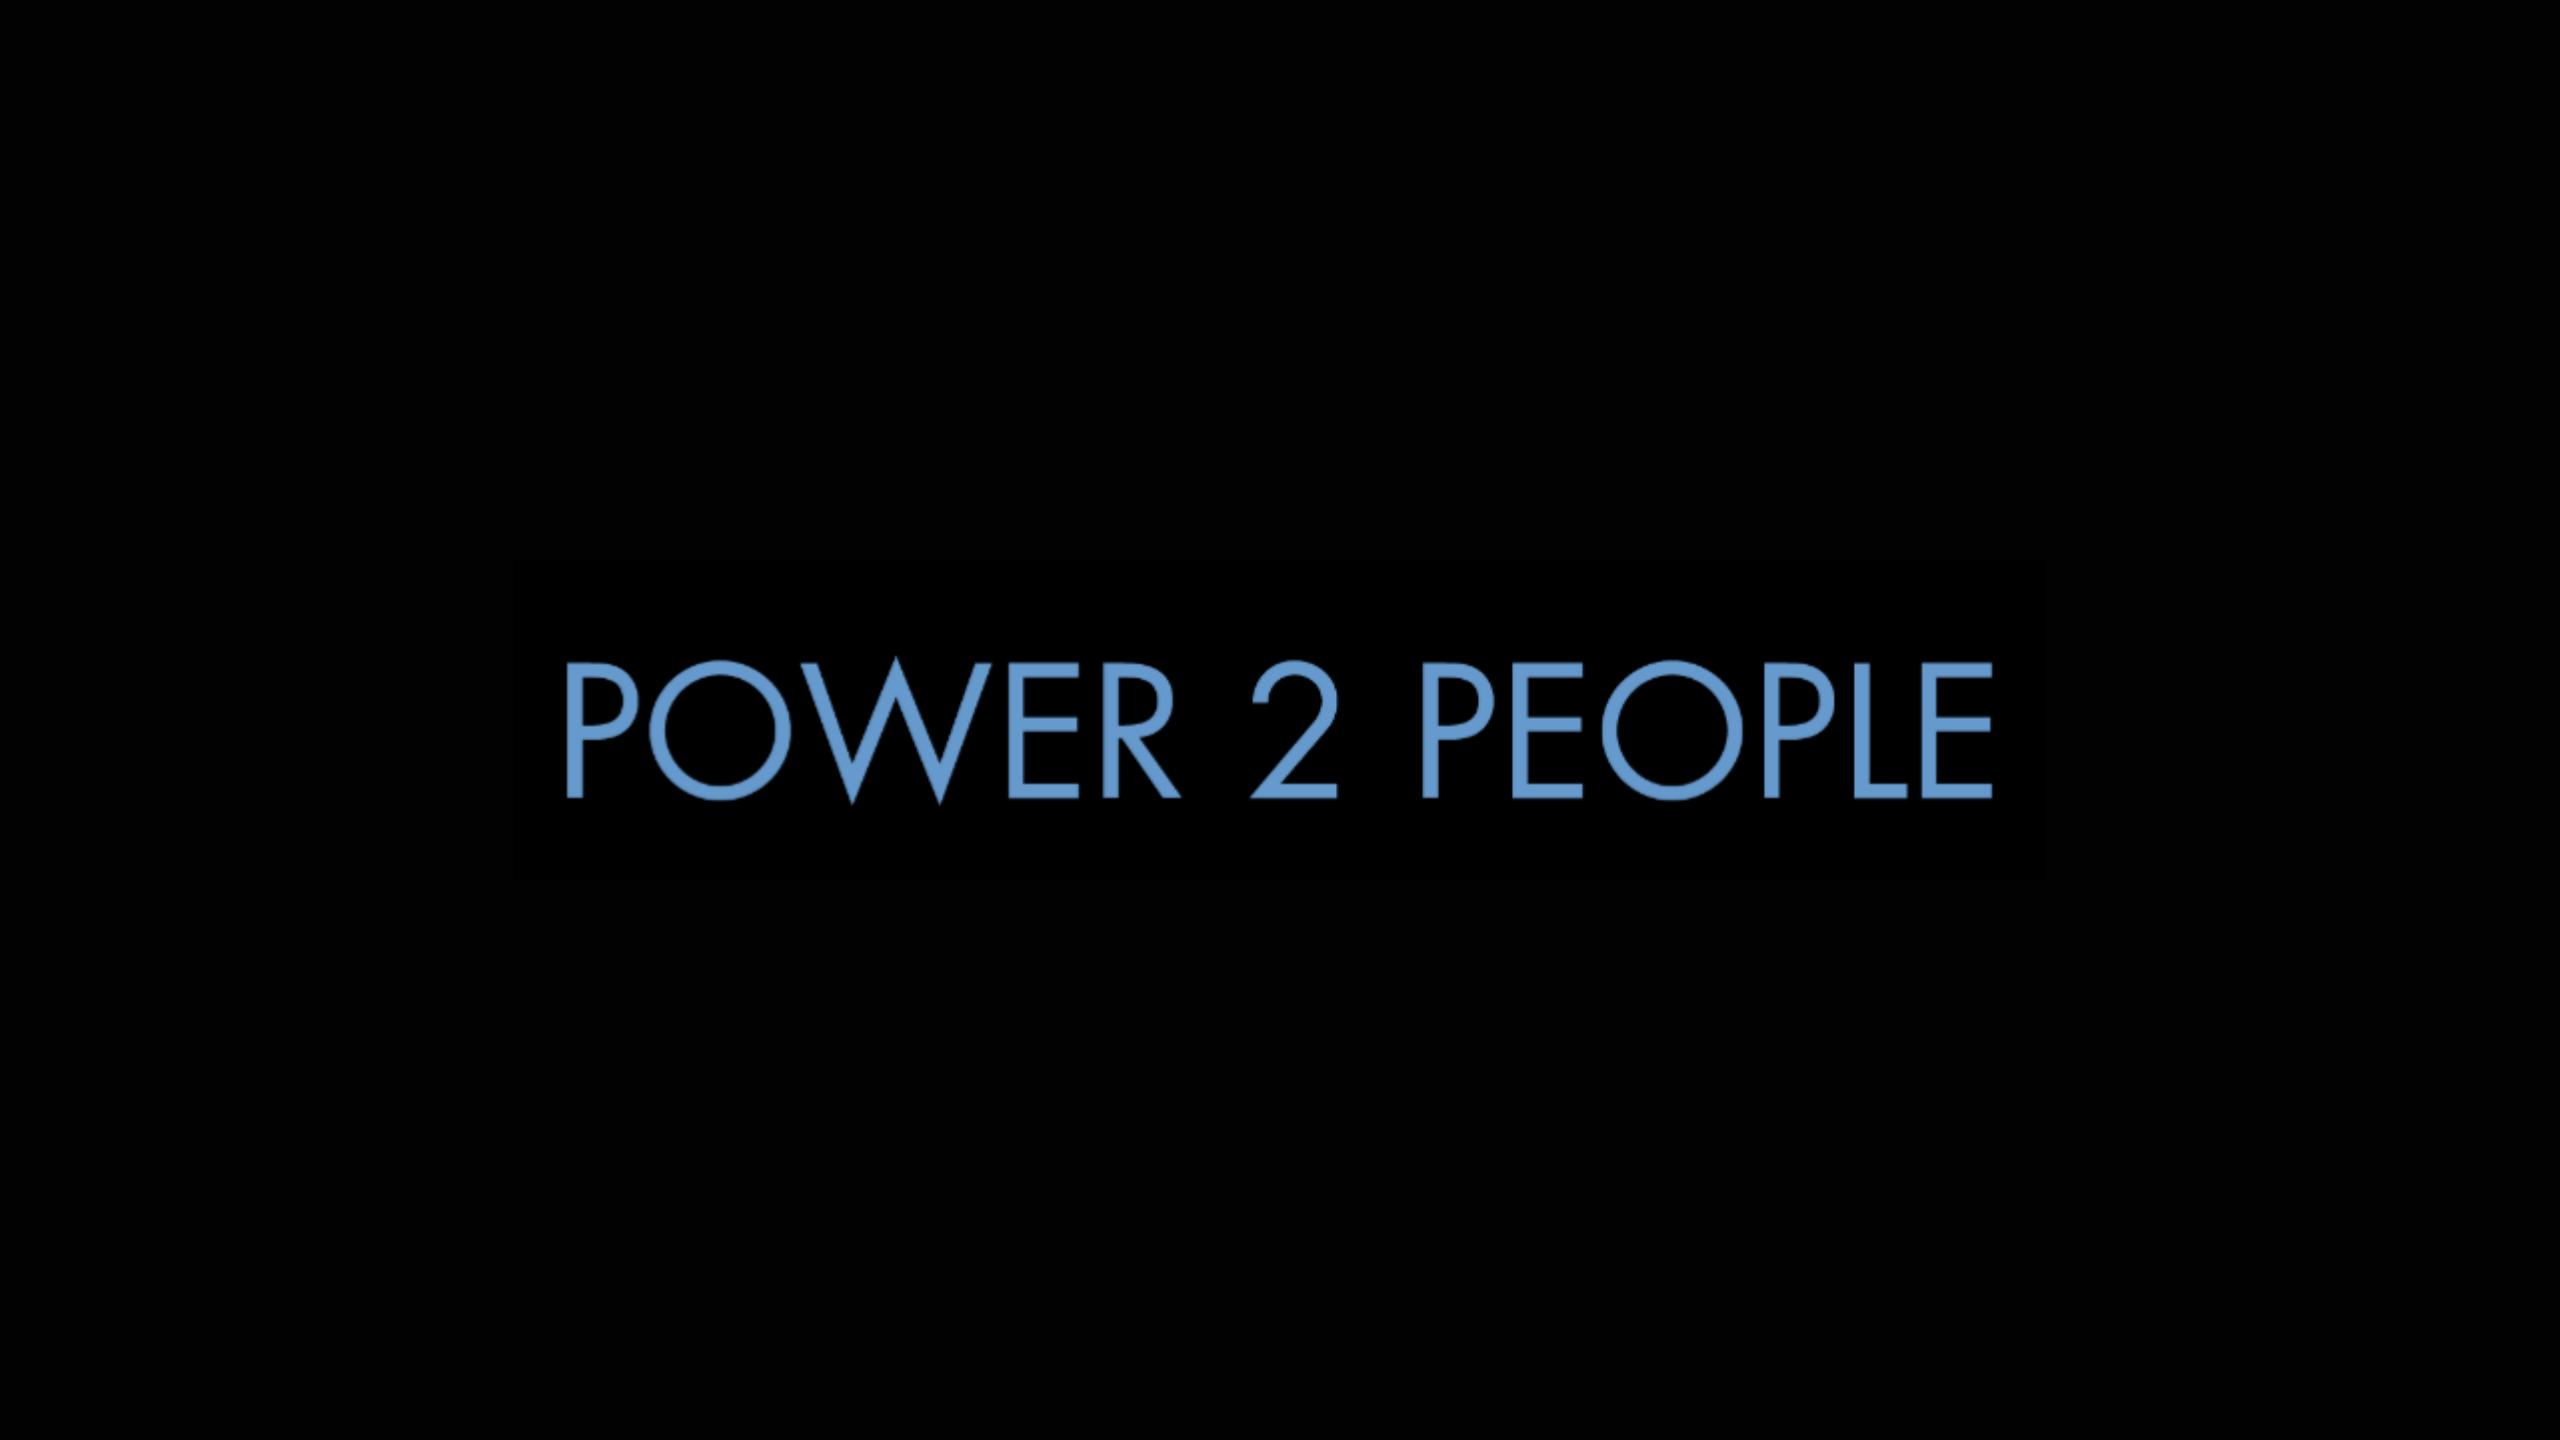 Power 2 People